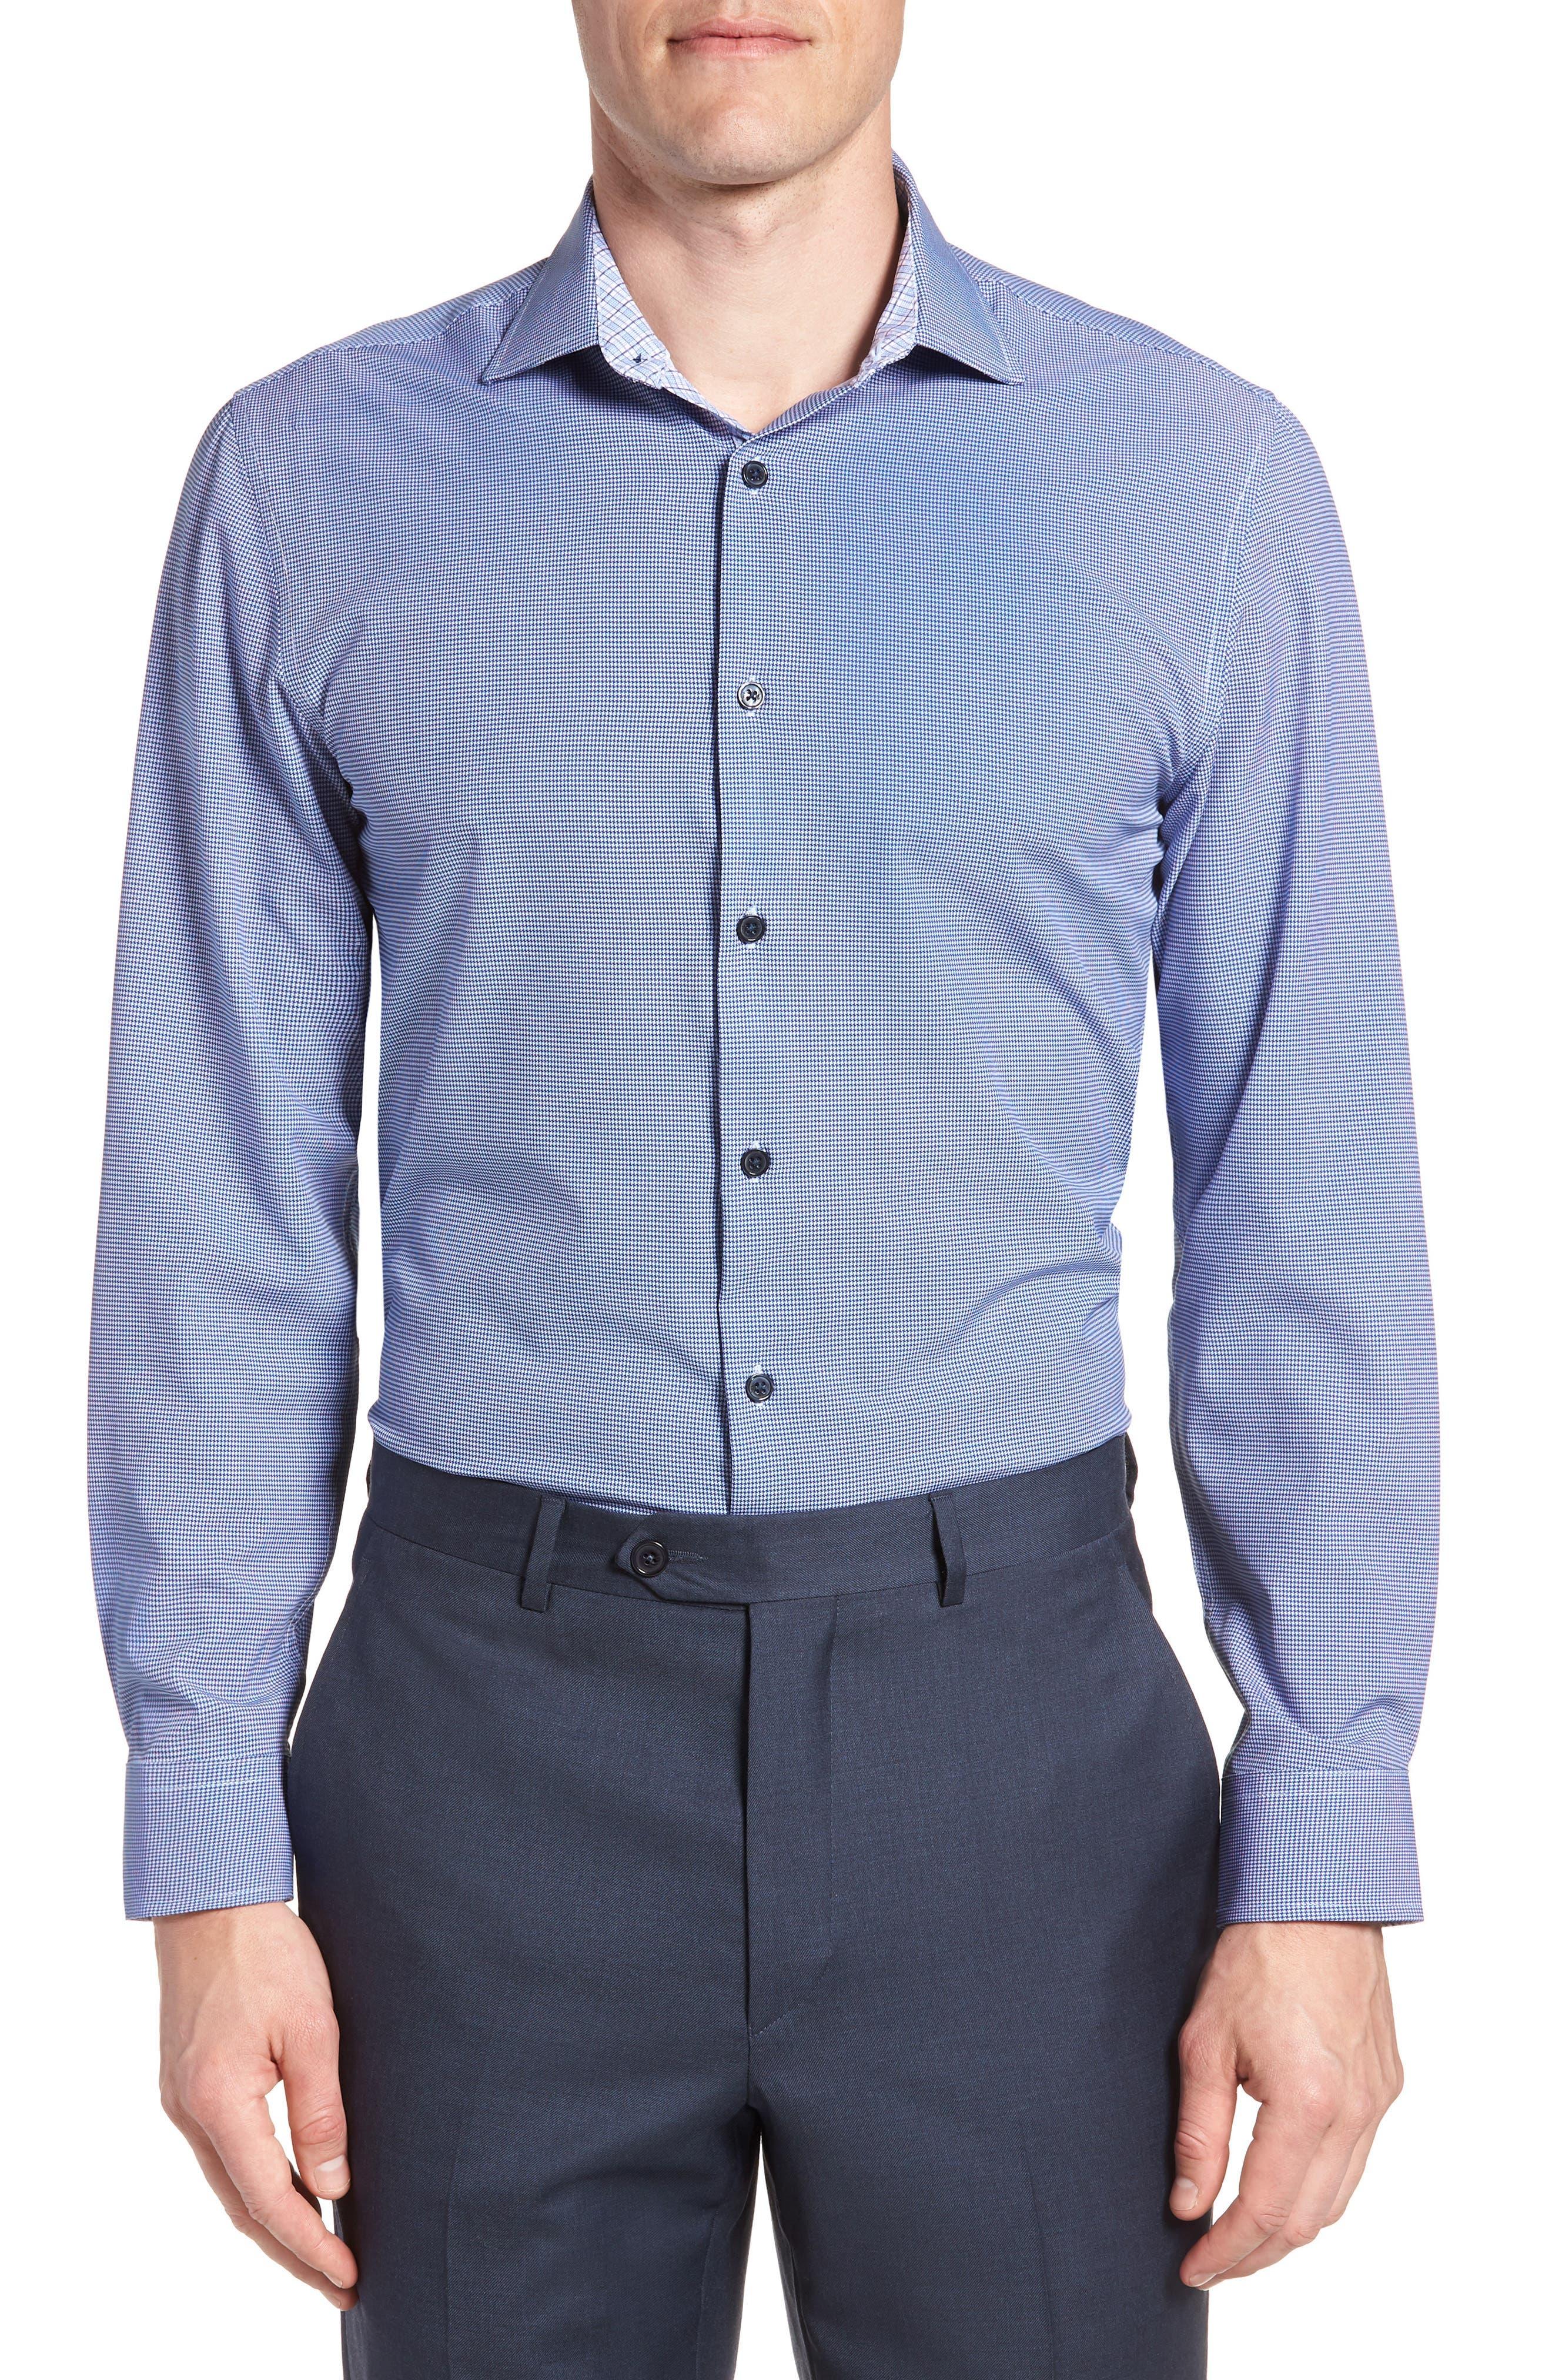 Trim Fit Houndstooth 4-Way Stretch Dress Shirt,                         Main,                         color, NAVY